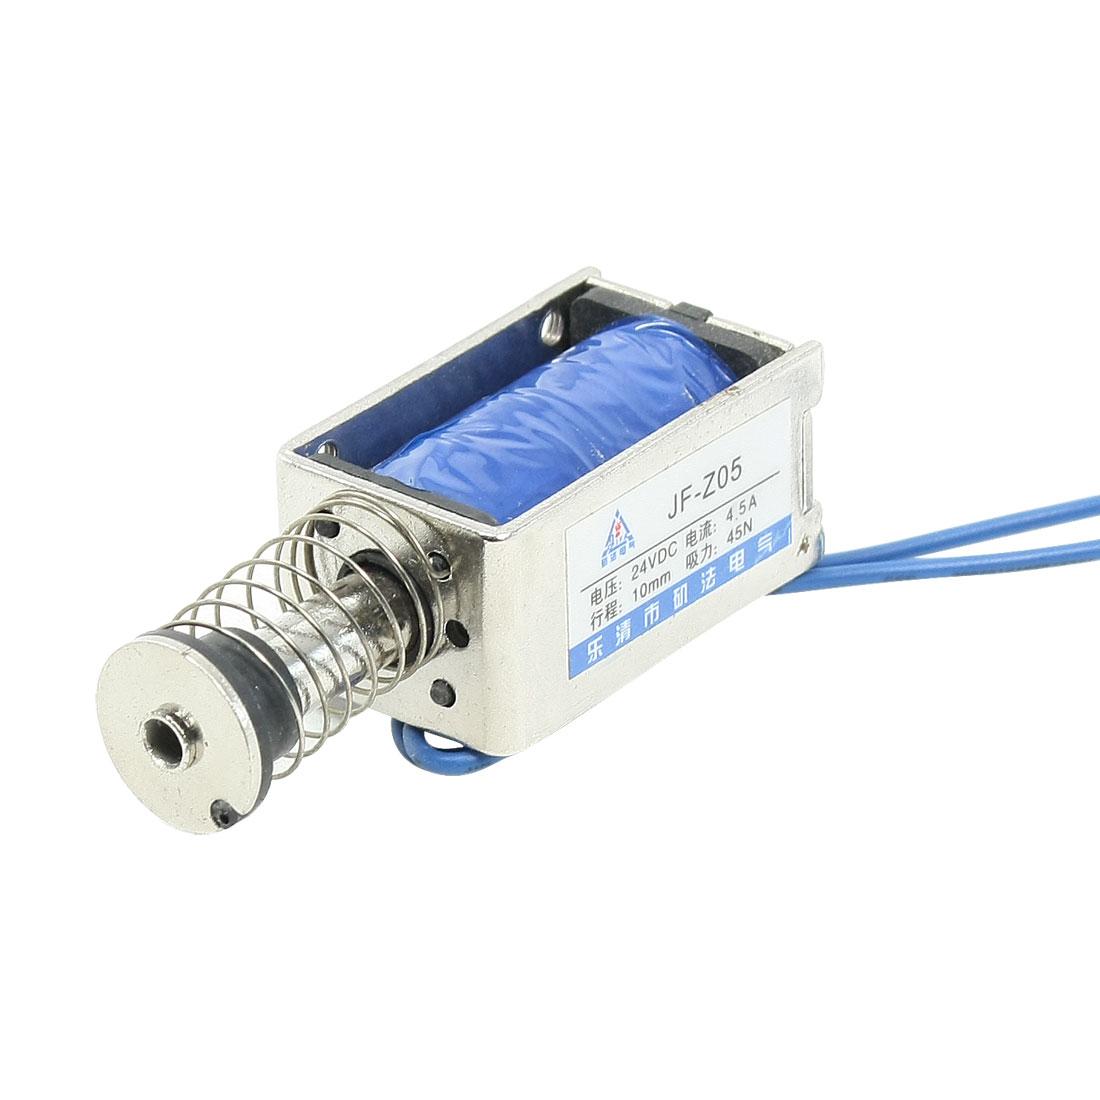 DC 24V 400mA Push Type Open Frame Solenoid Electromagnet 10mm 45N 9.9LB